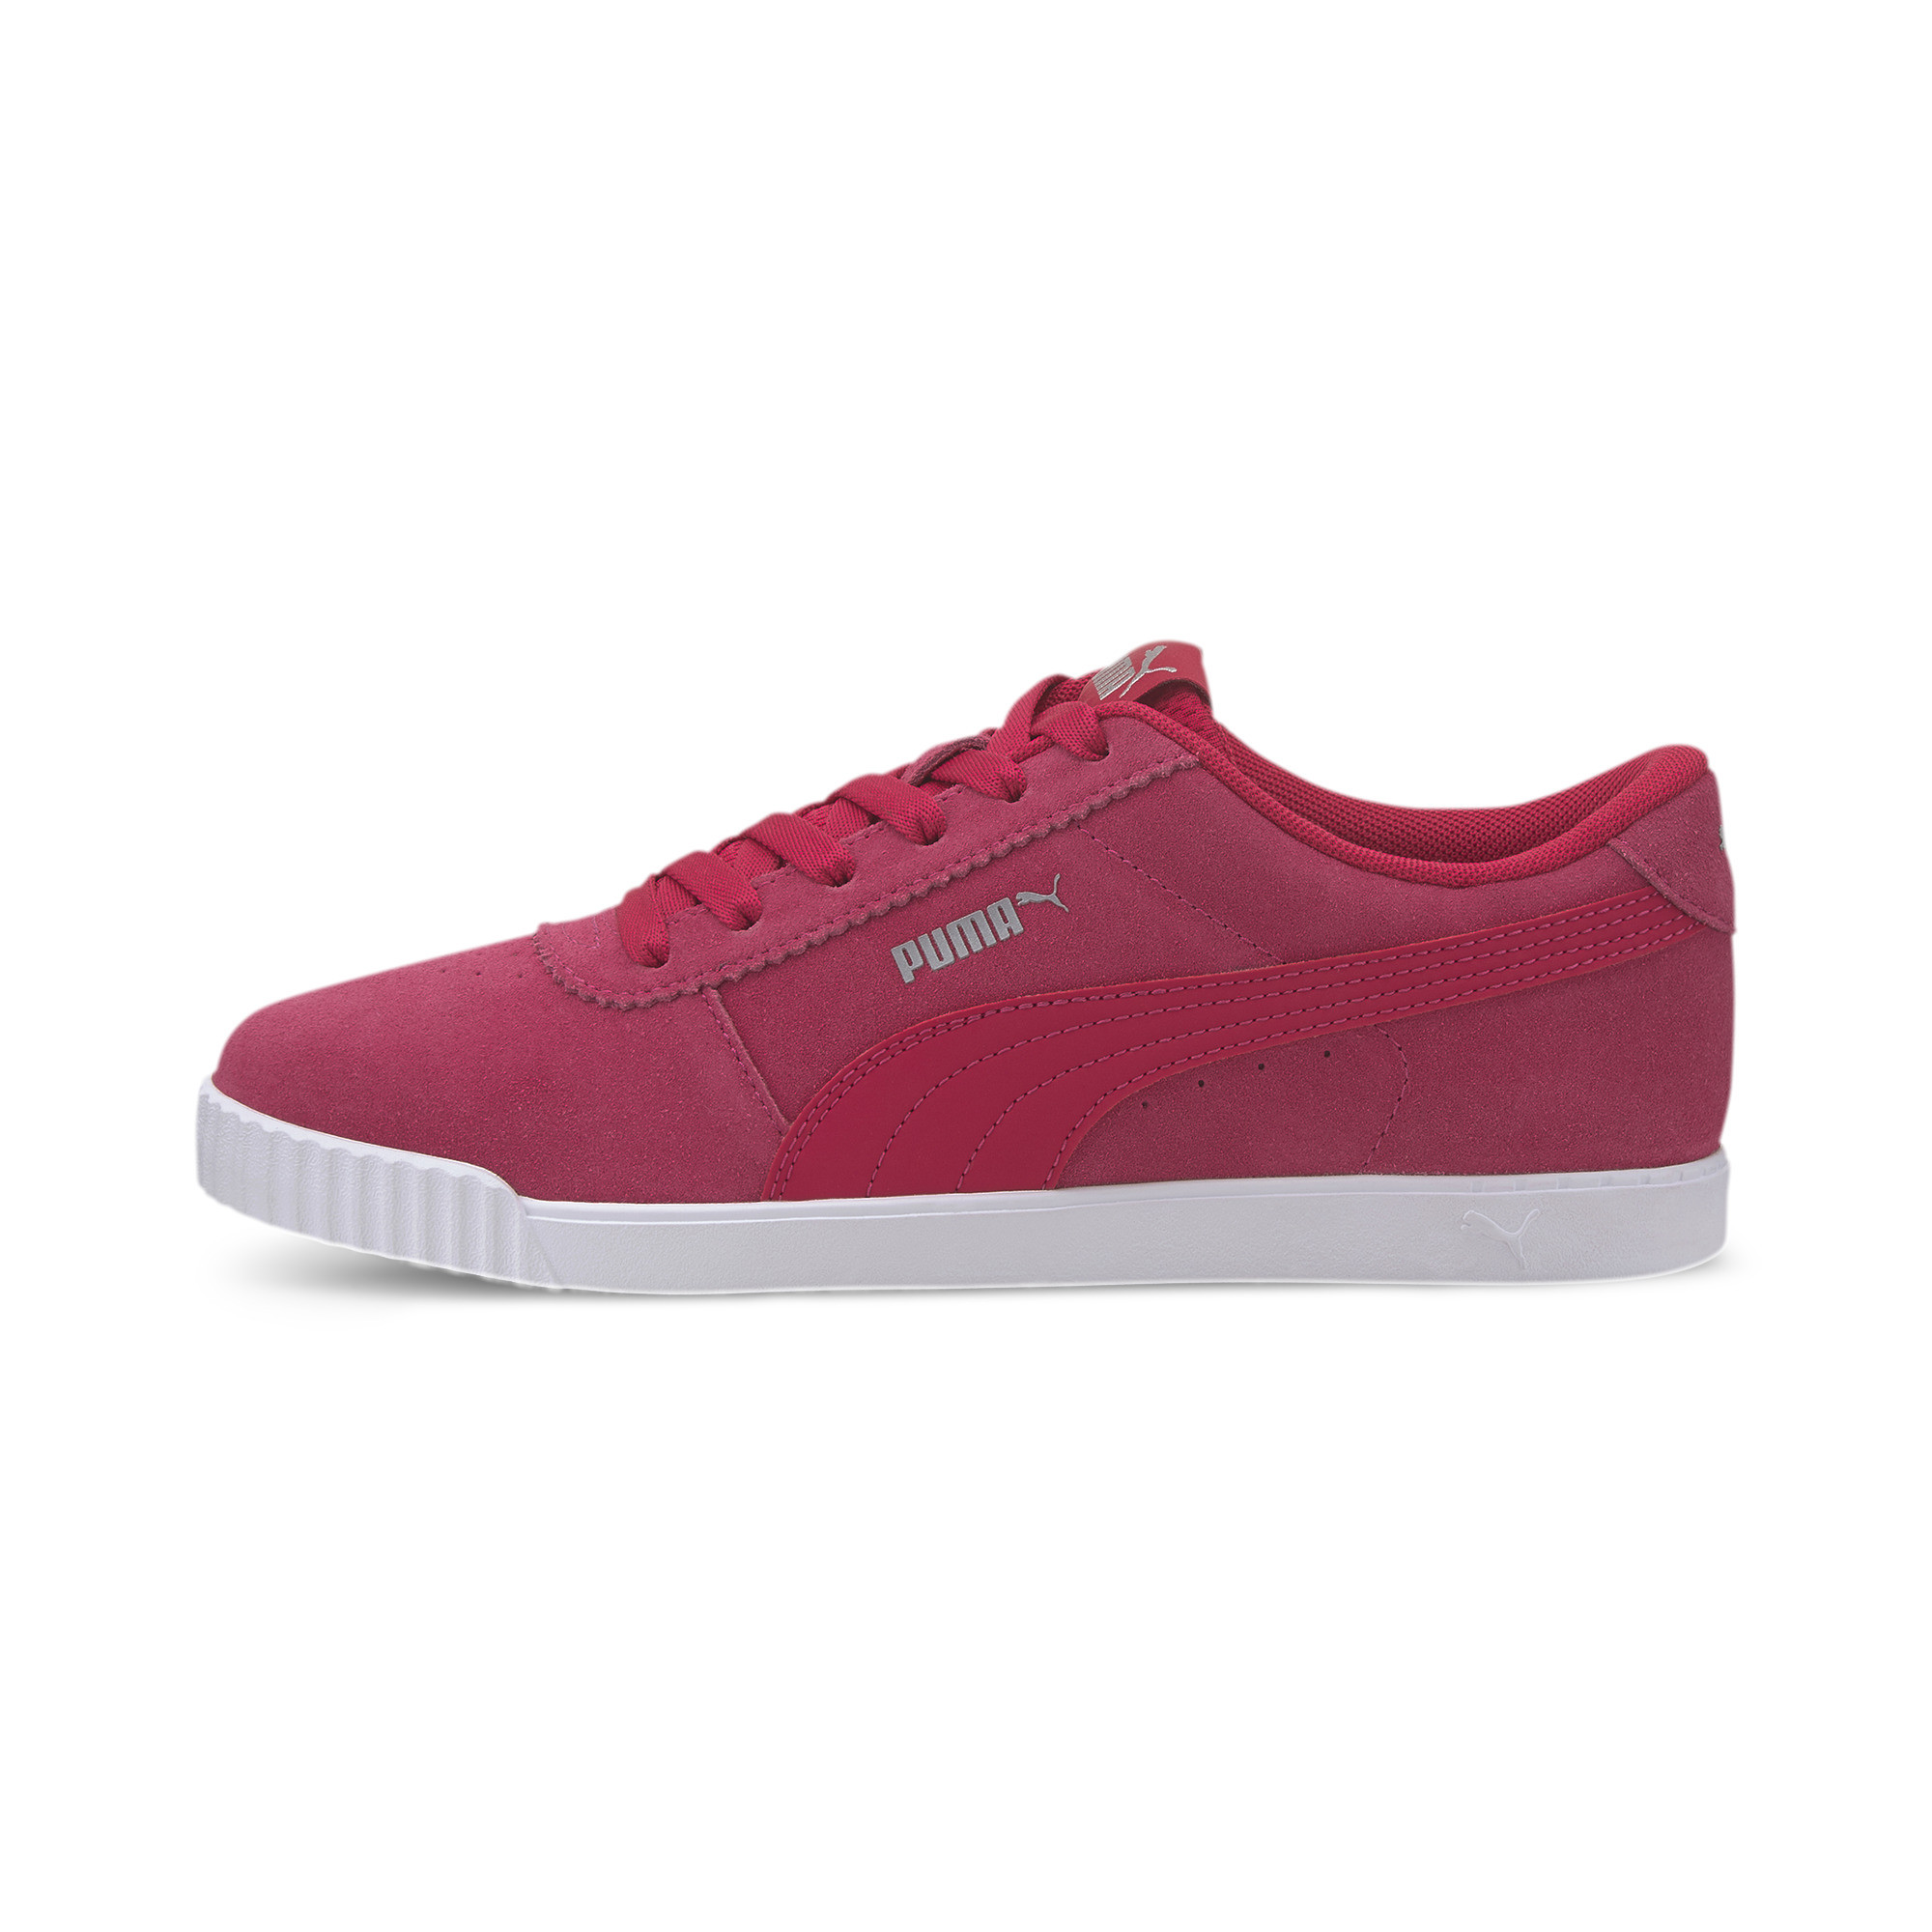 PUMA-Women-039-s-Carina-Slim-Suede-Sneakers thumbnail 11